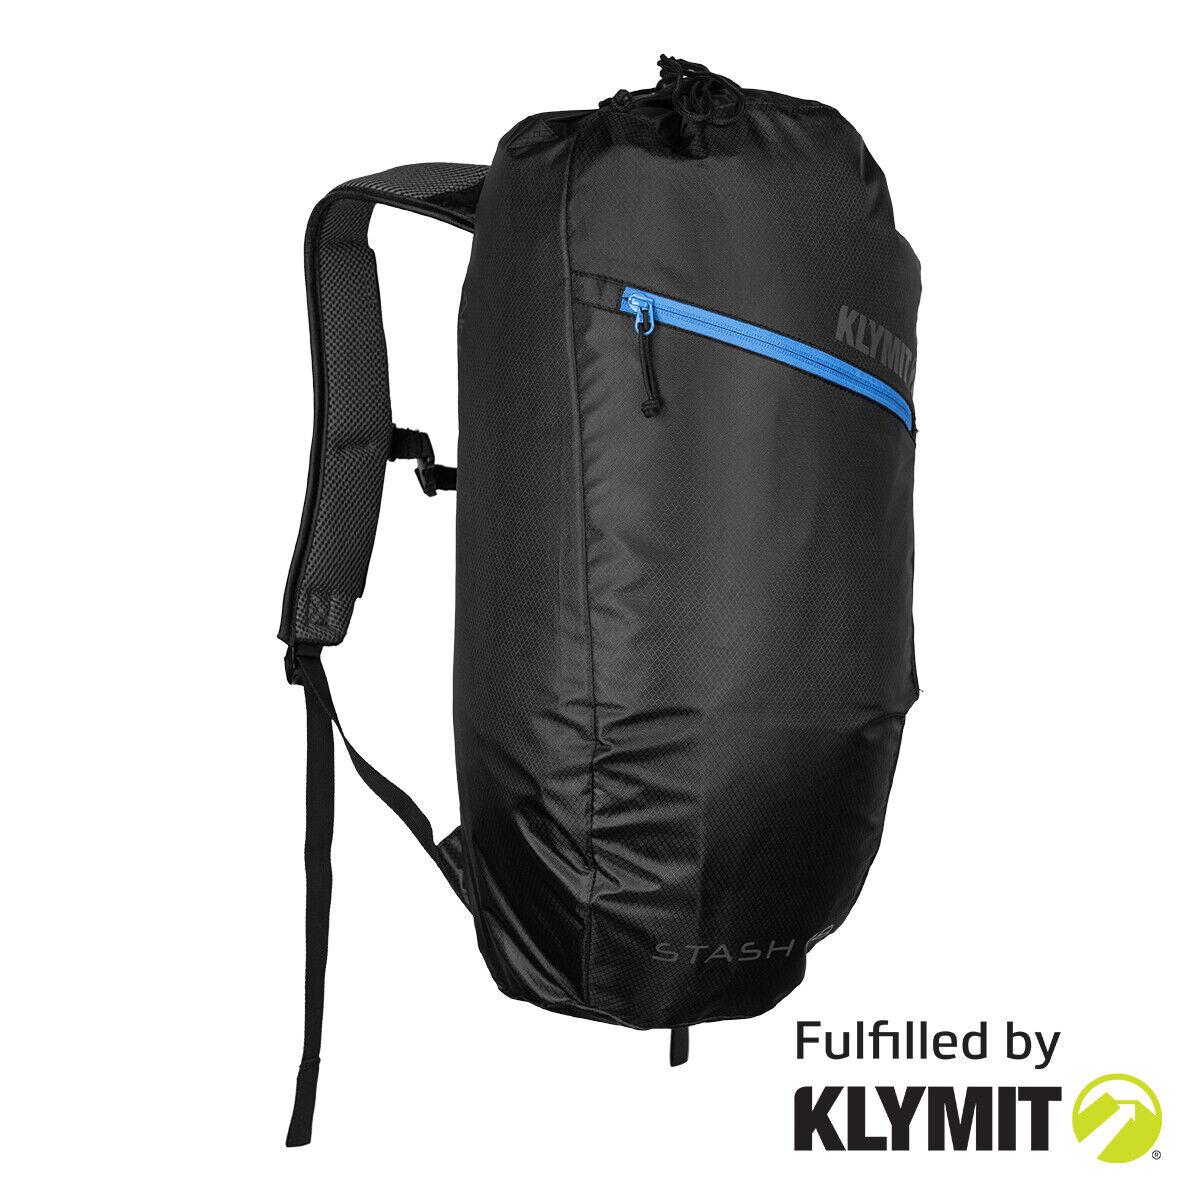 Klymit Stash 18 Day Pack Black